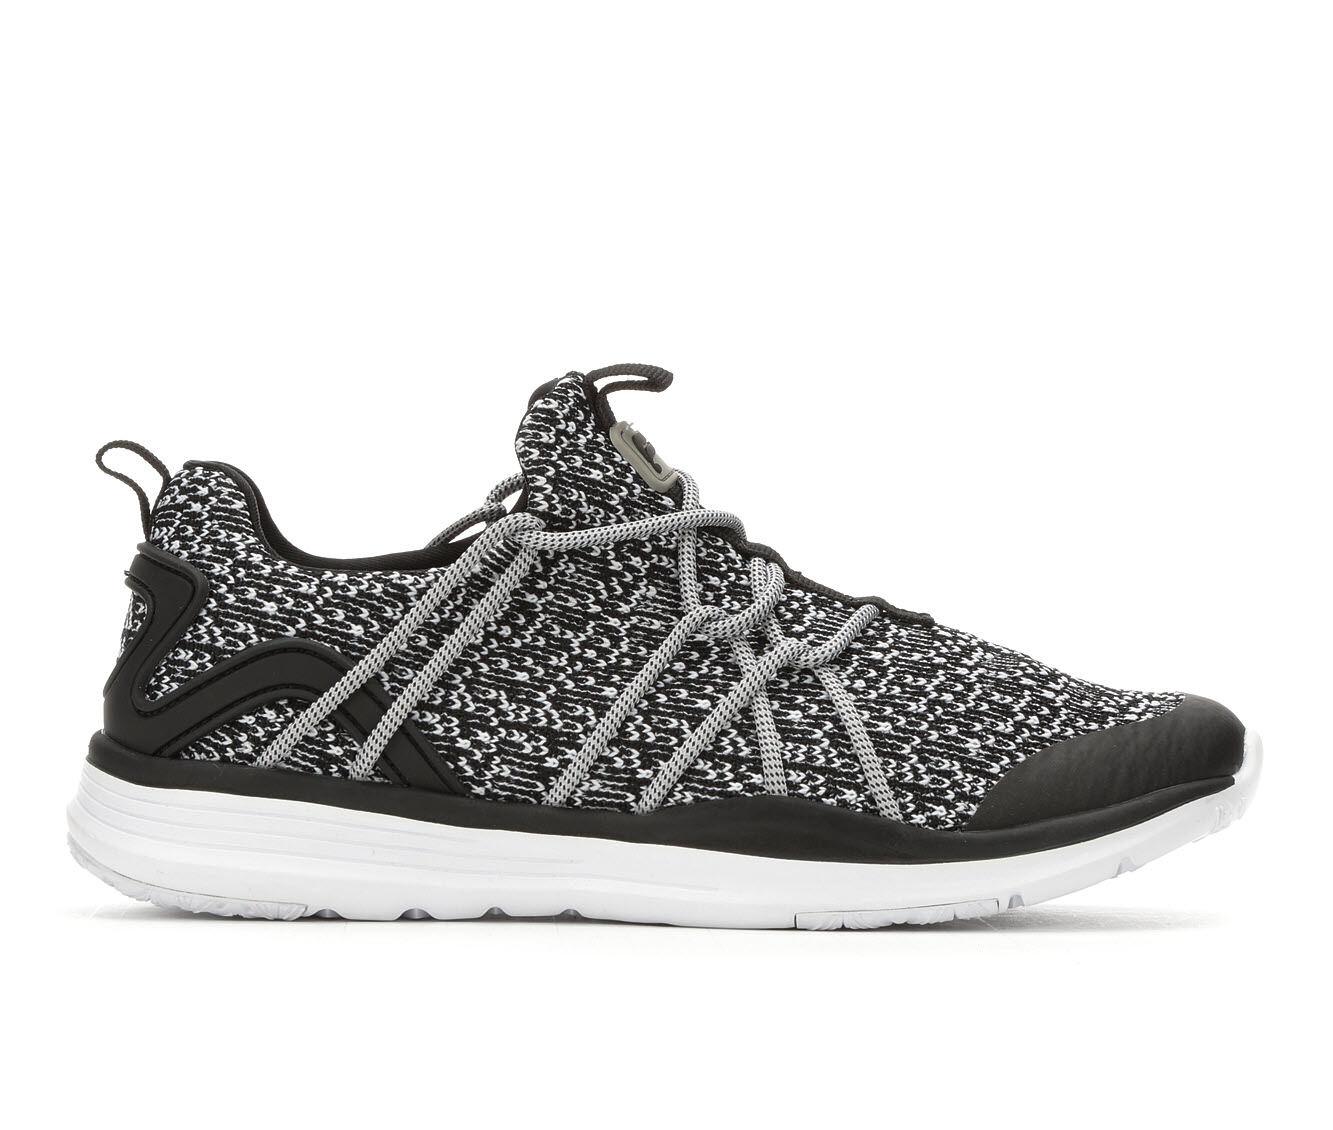 uk shoes_kd2745